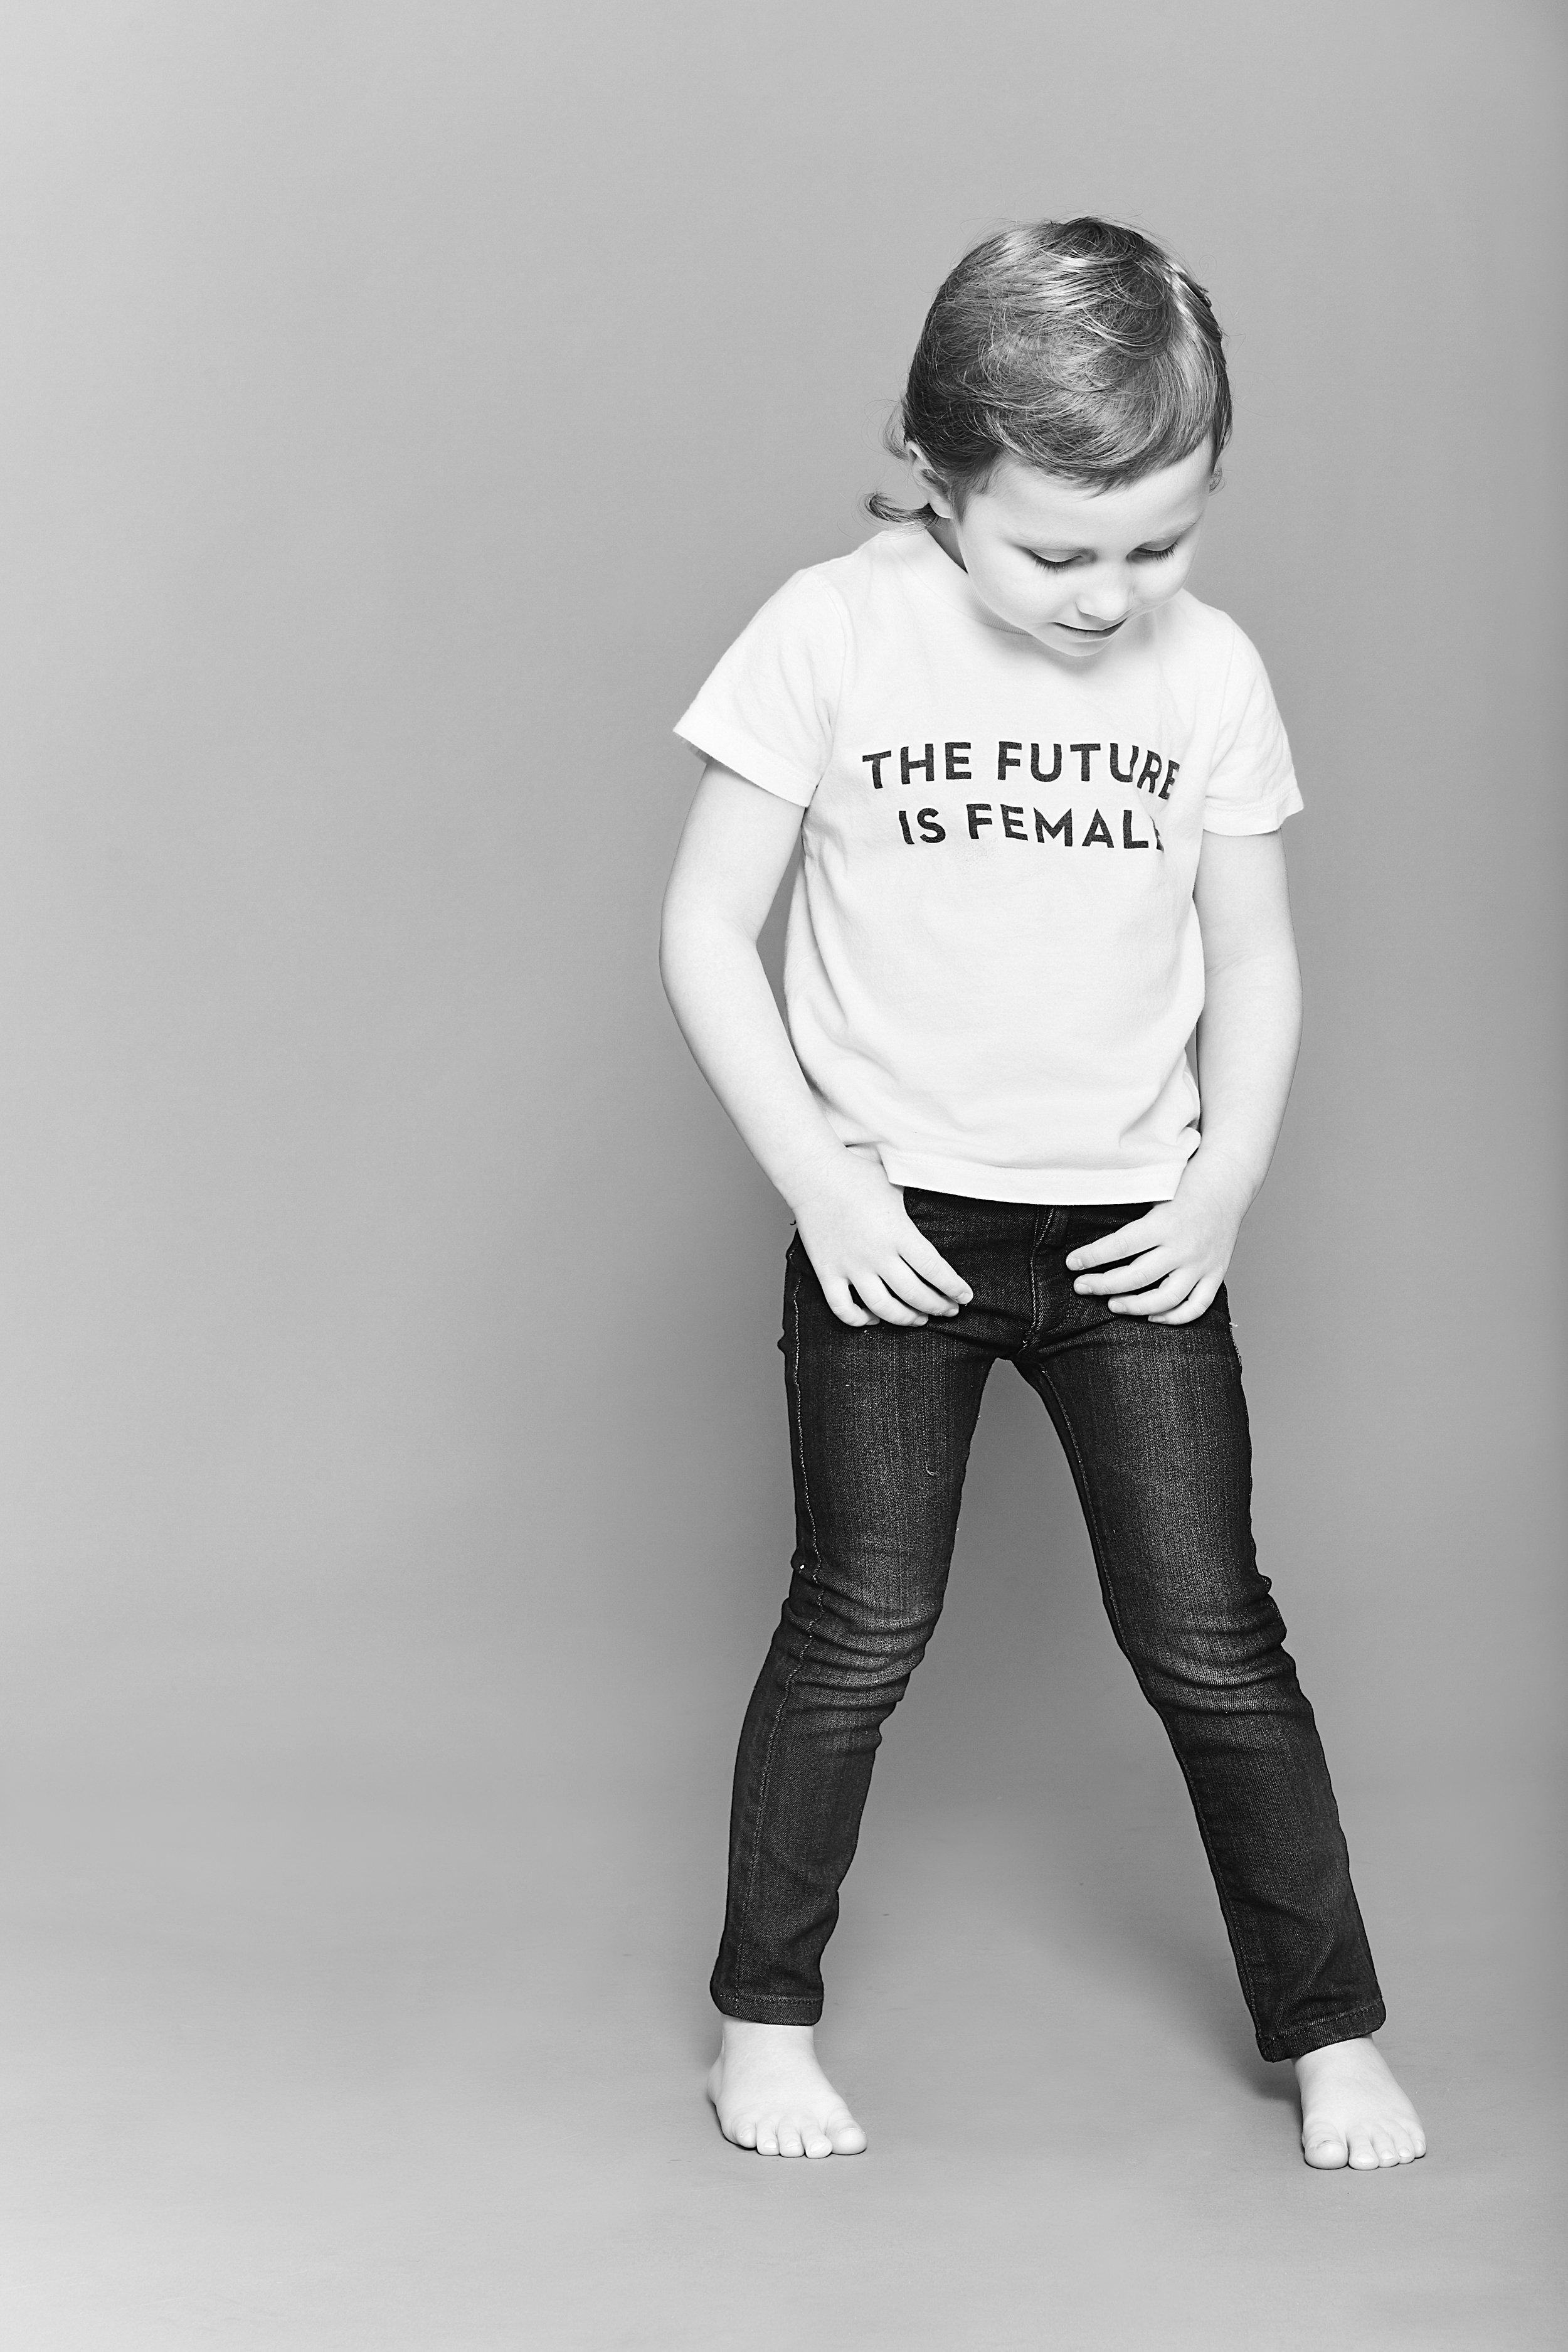 2017_the_future_is_female_019_bw_r.jpg